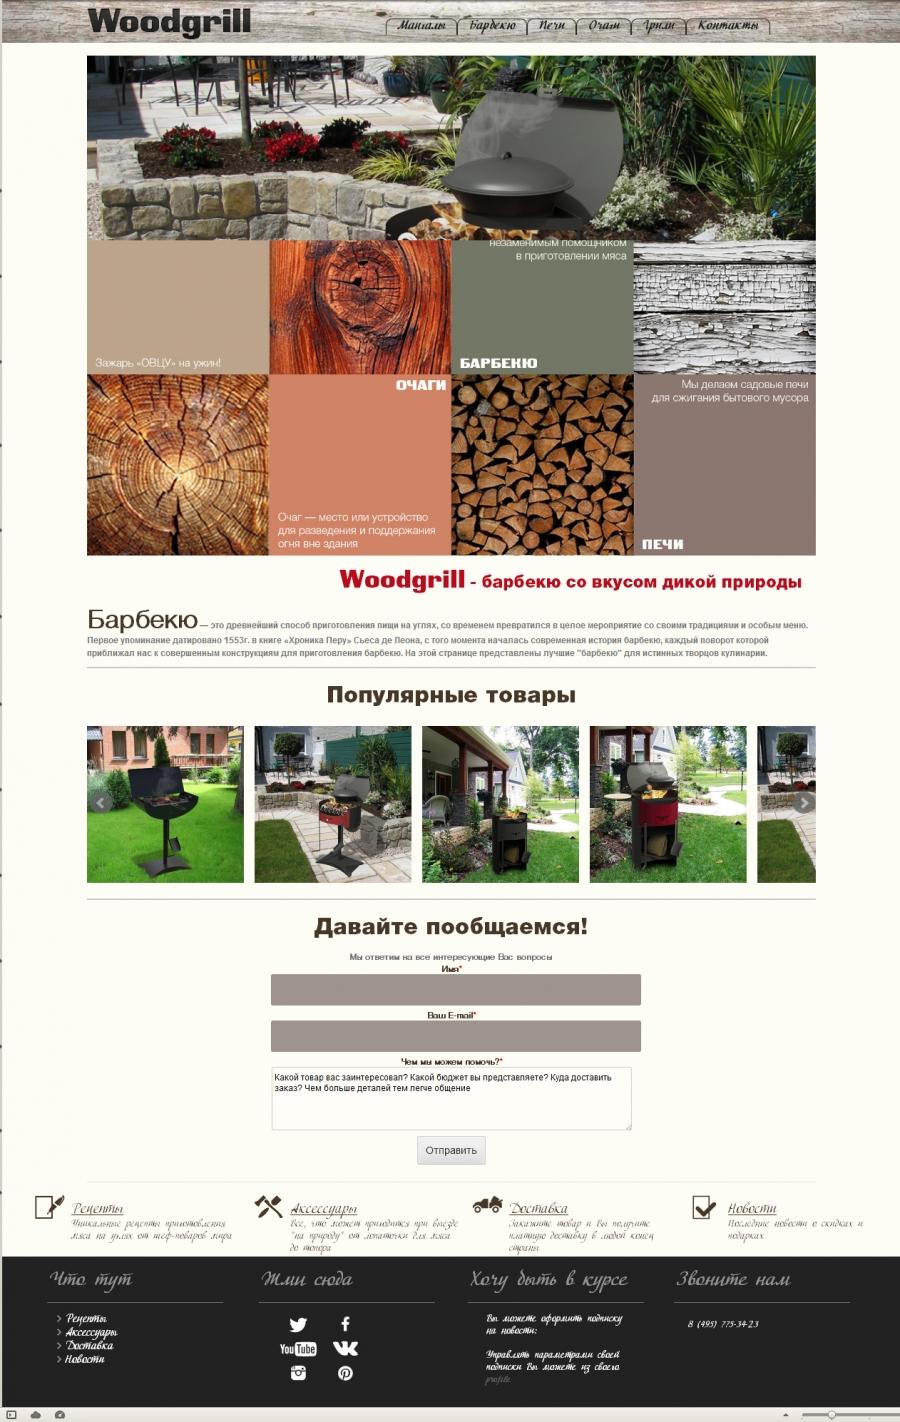 Woodgrill